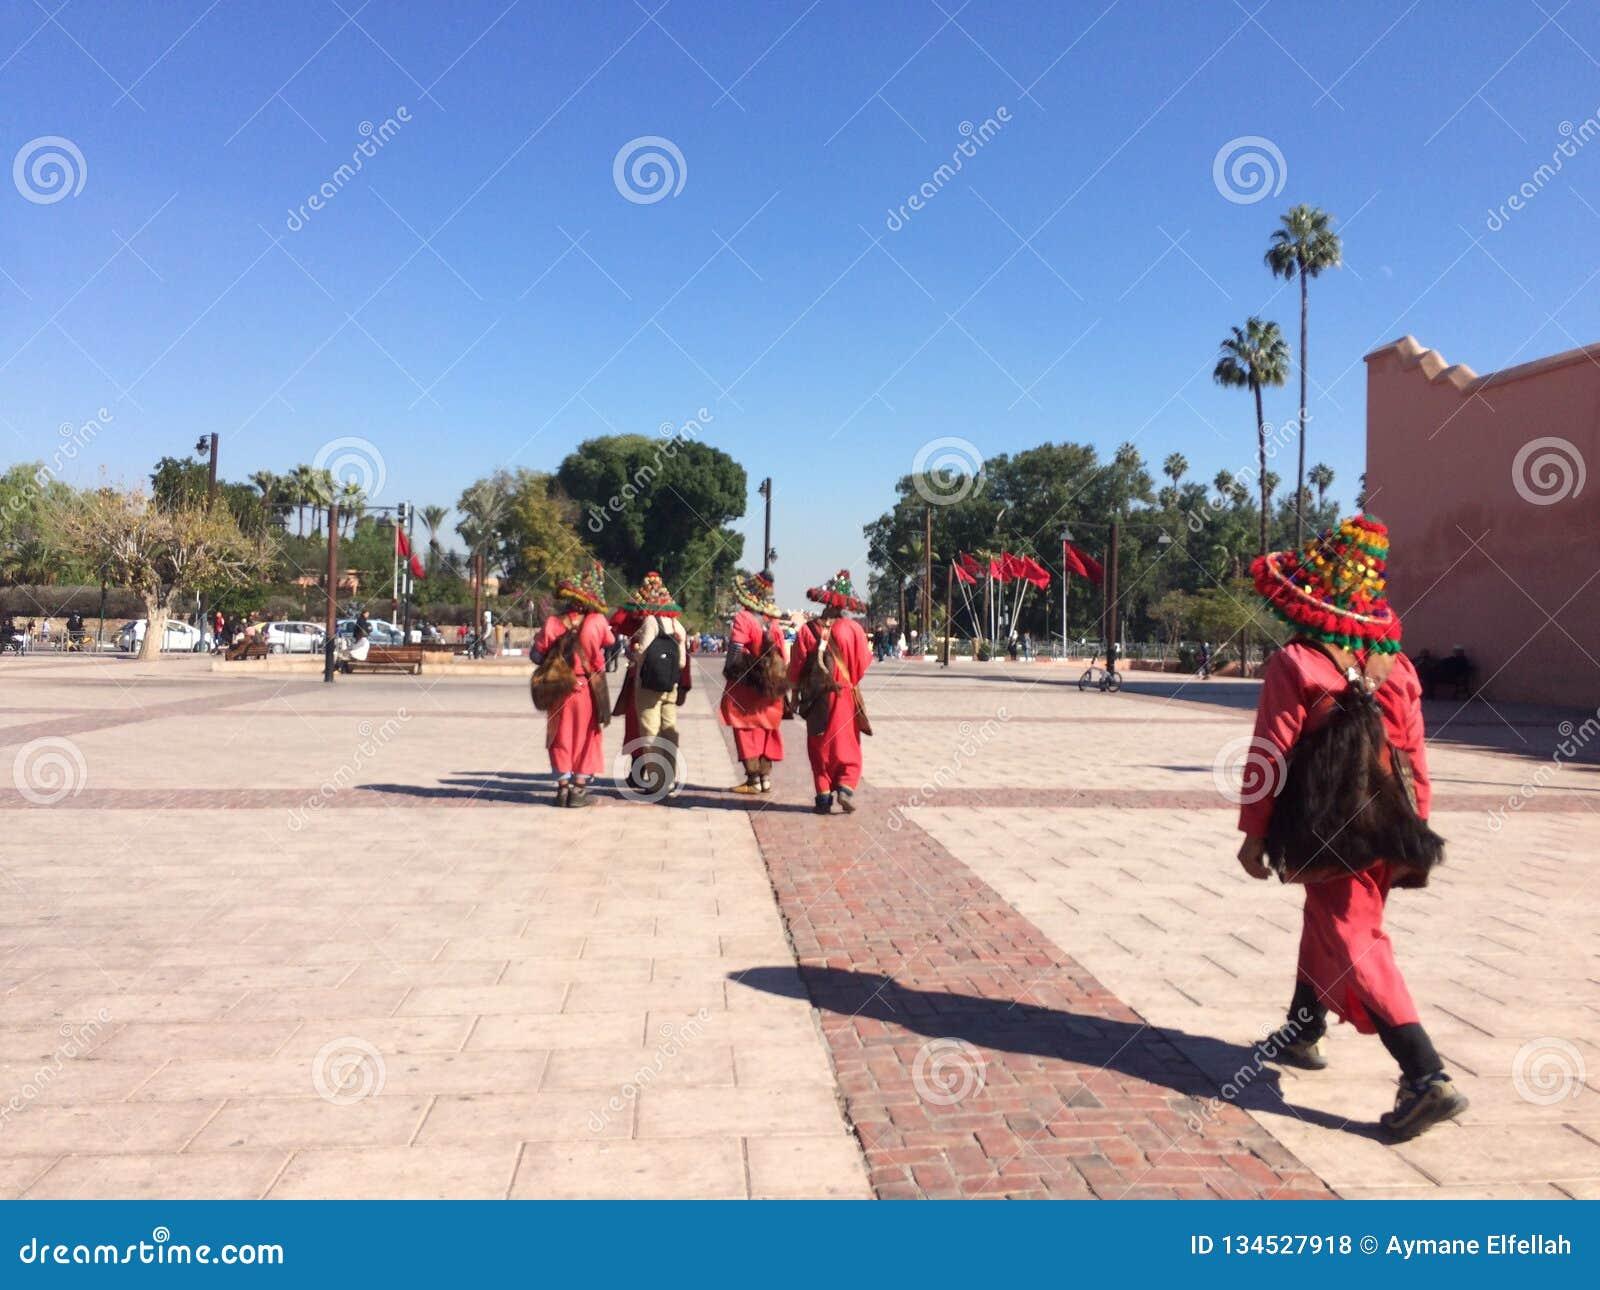 Marrakech morocco jamaa elfna